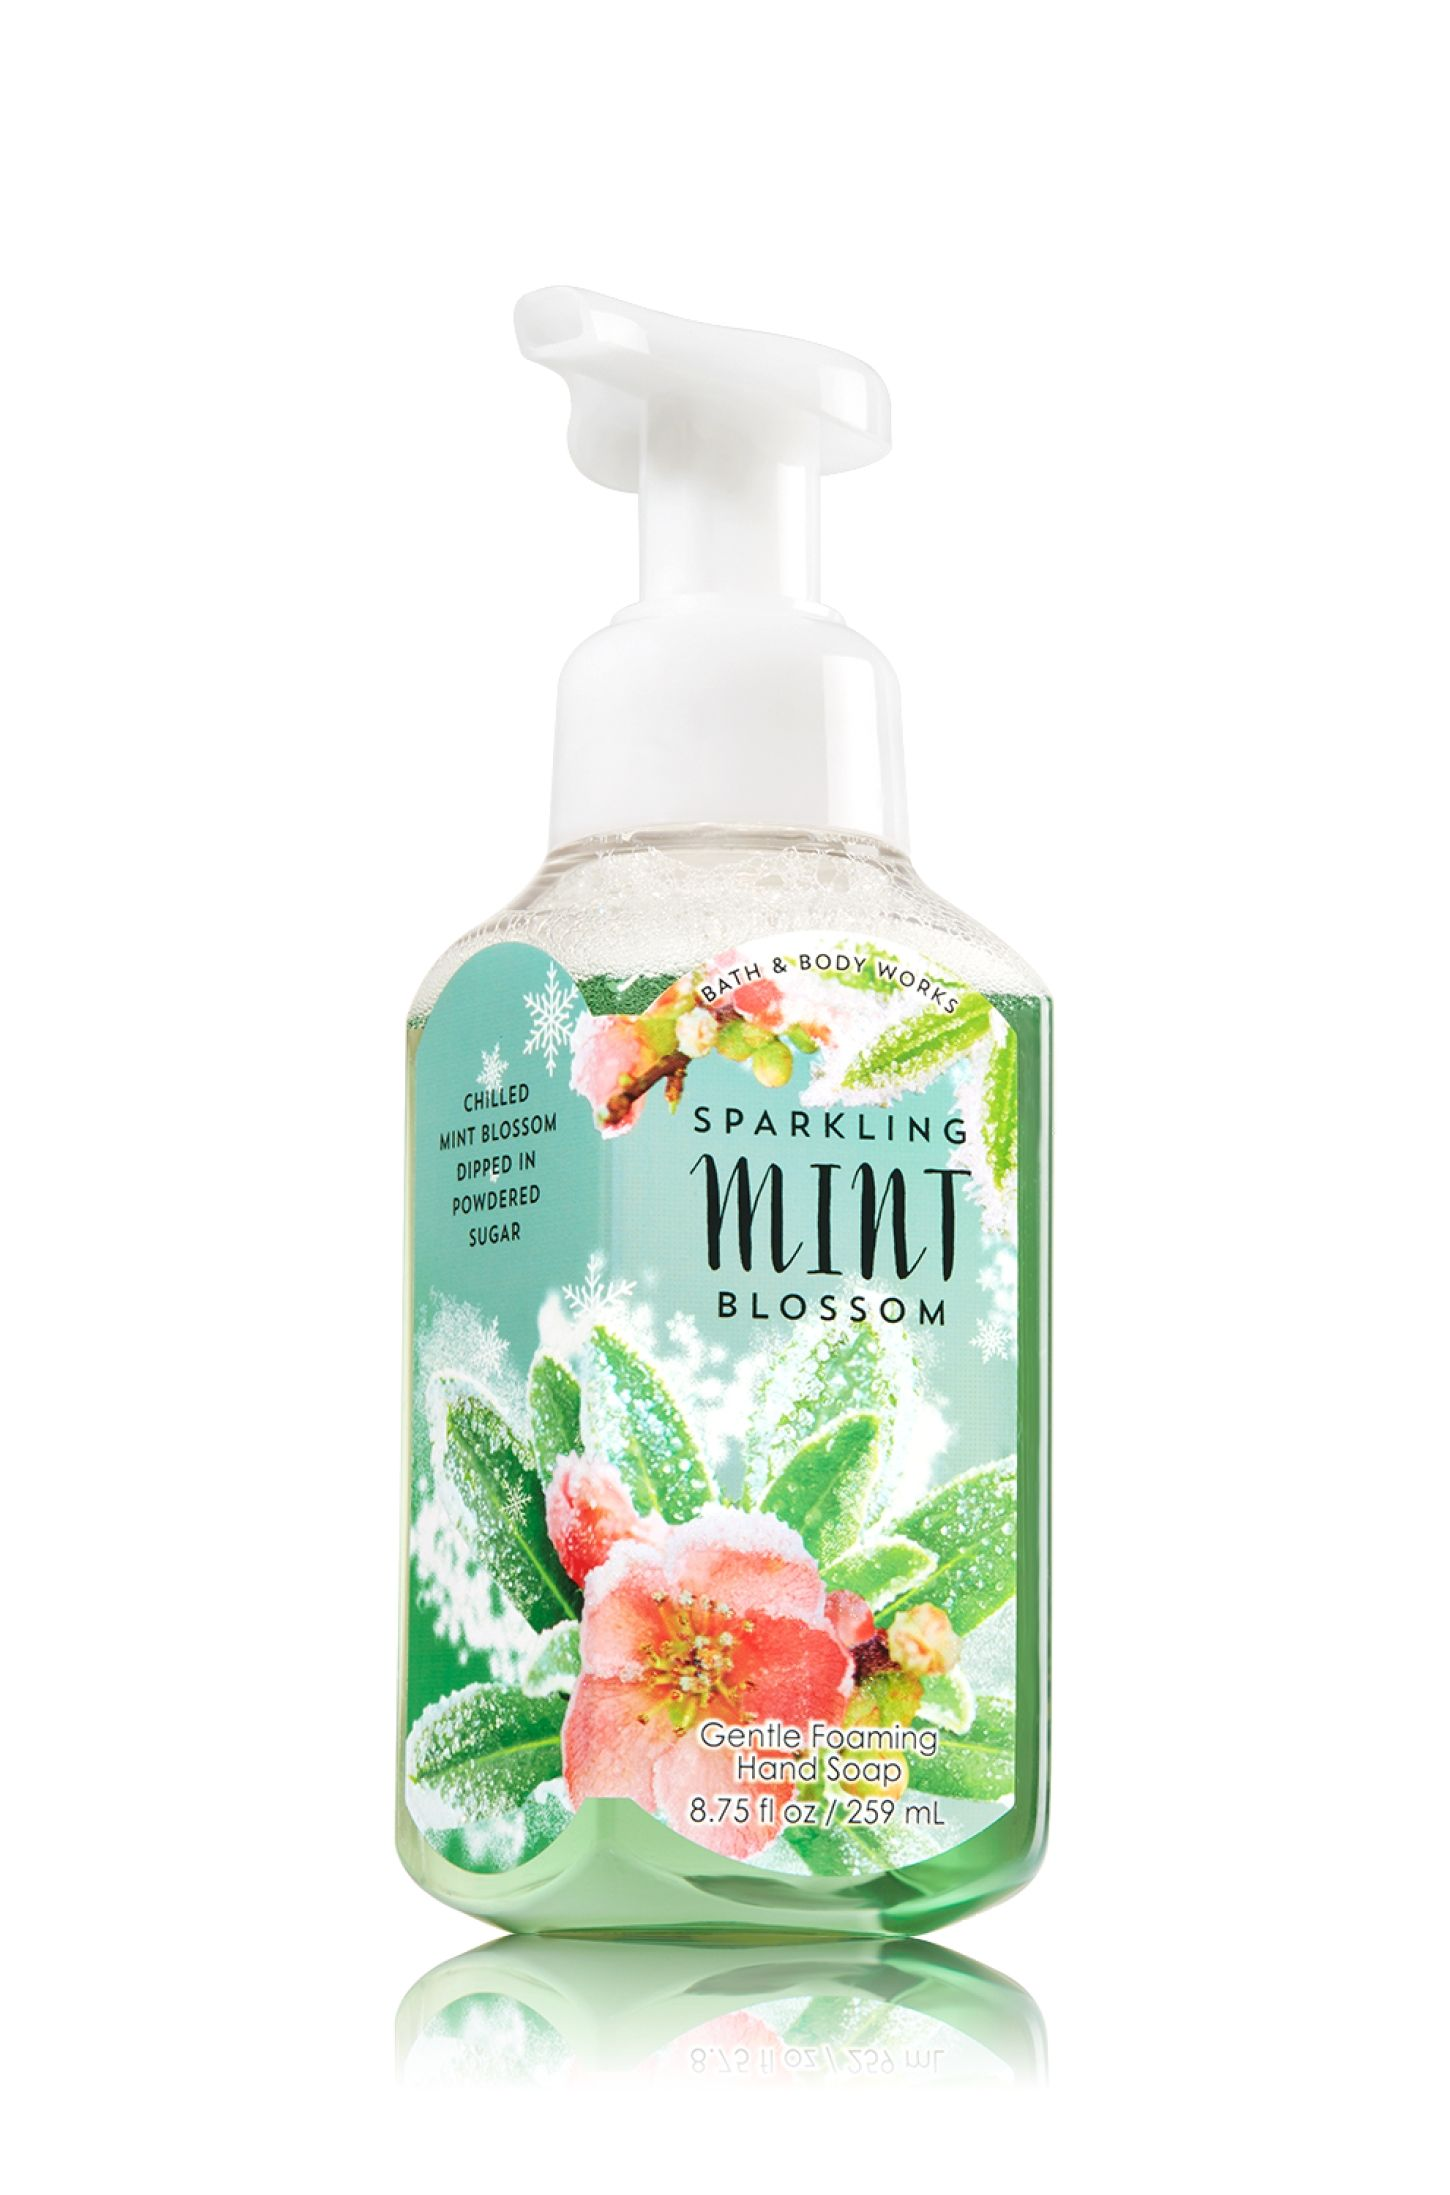 Sparkling Mint Blossom Gentle Foaming Hand Soap Soap Sanitizer